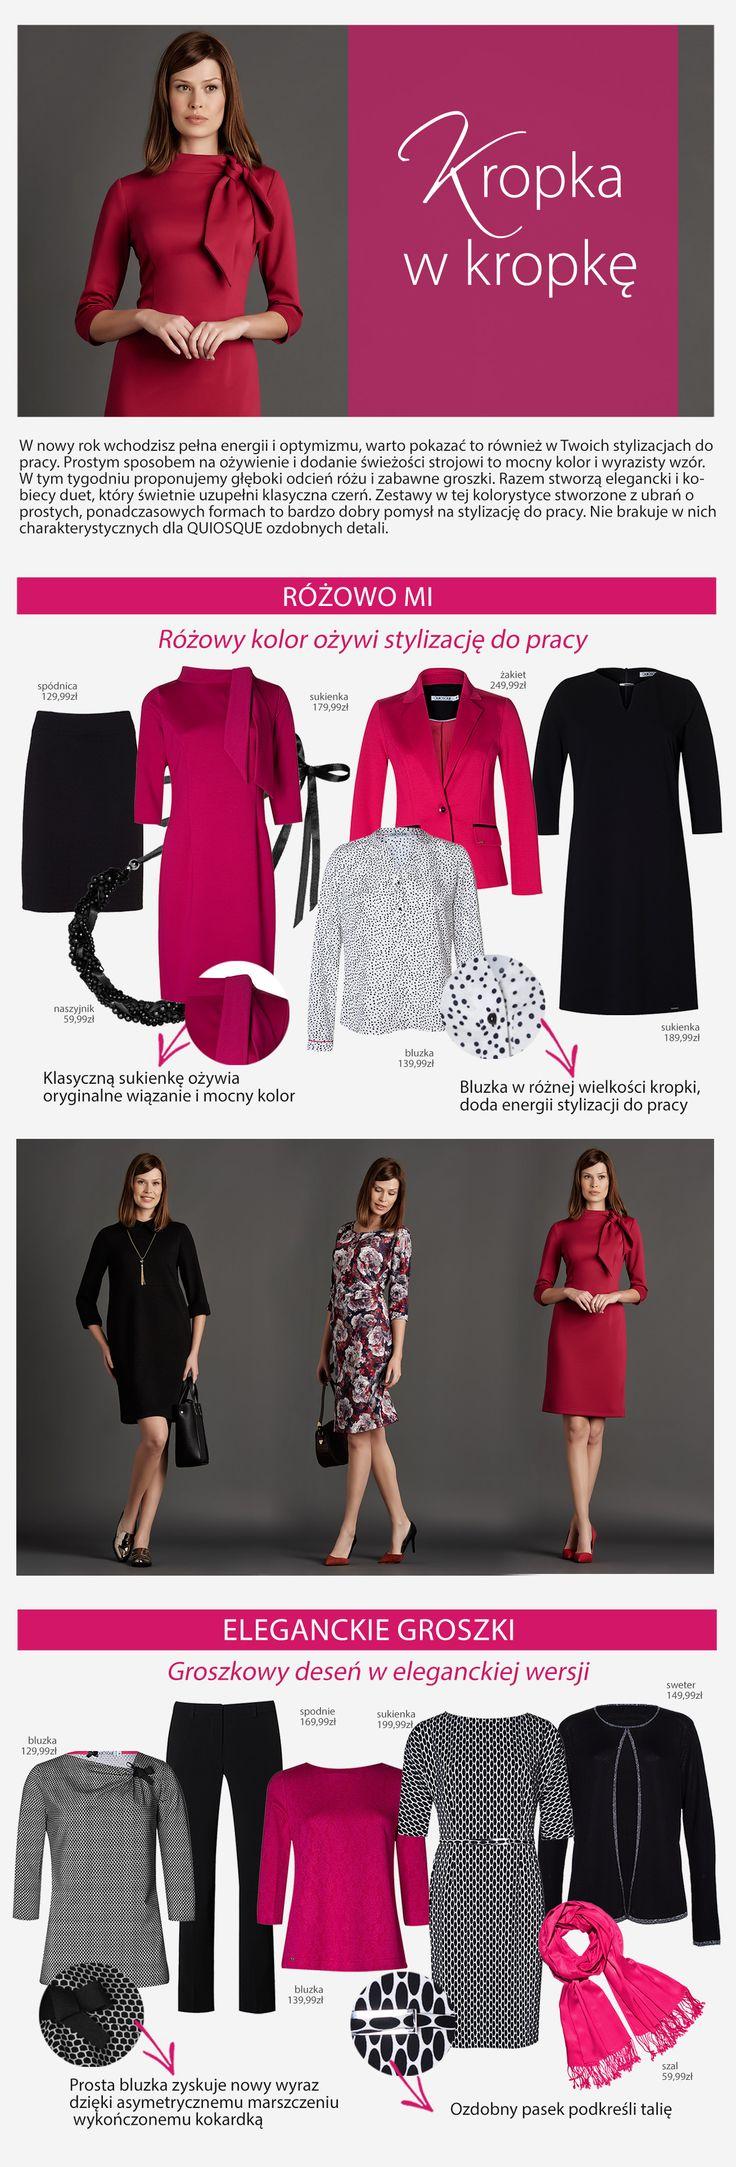 #quiosquepl #quiosque #naszeinspiracje #poniedzialek #monday #new #collection #lady #style #outfit #dress #blouse #jacket #feminine #kobieco #womanwear #trends #inspirations #autumn #winter